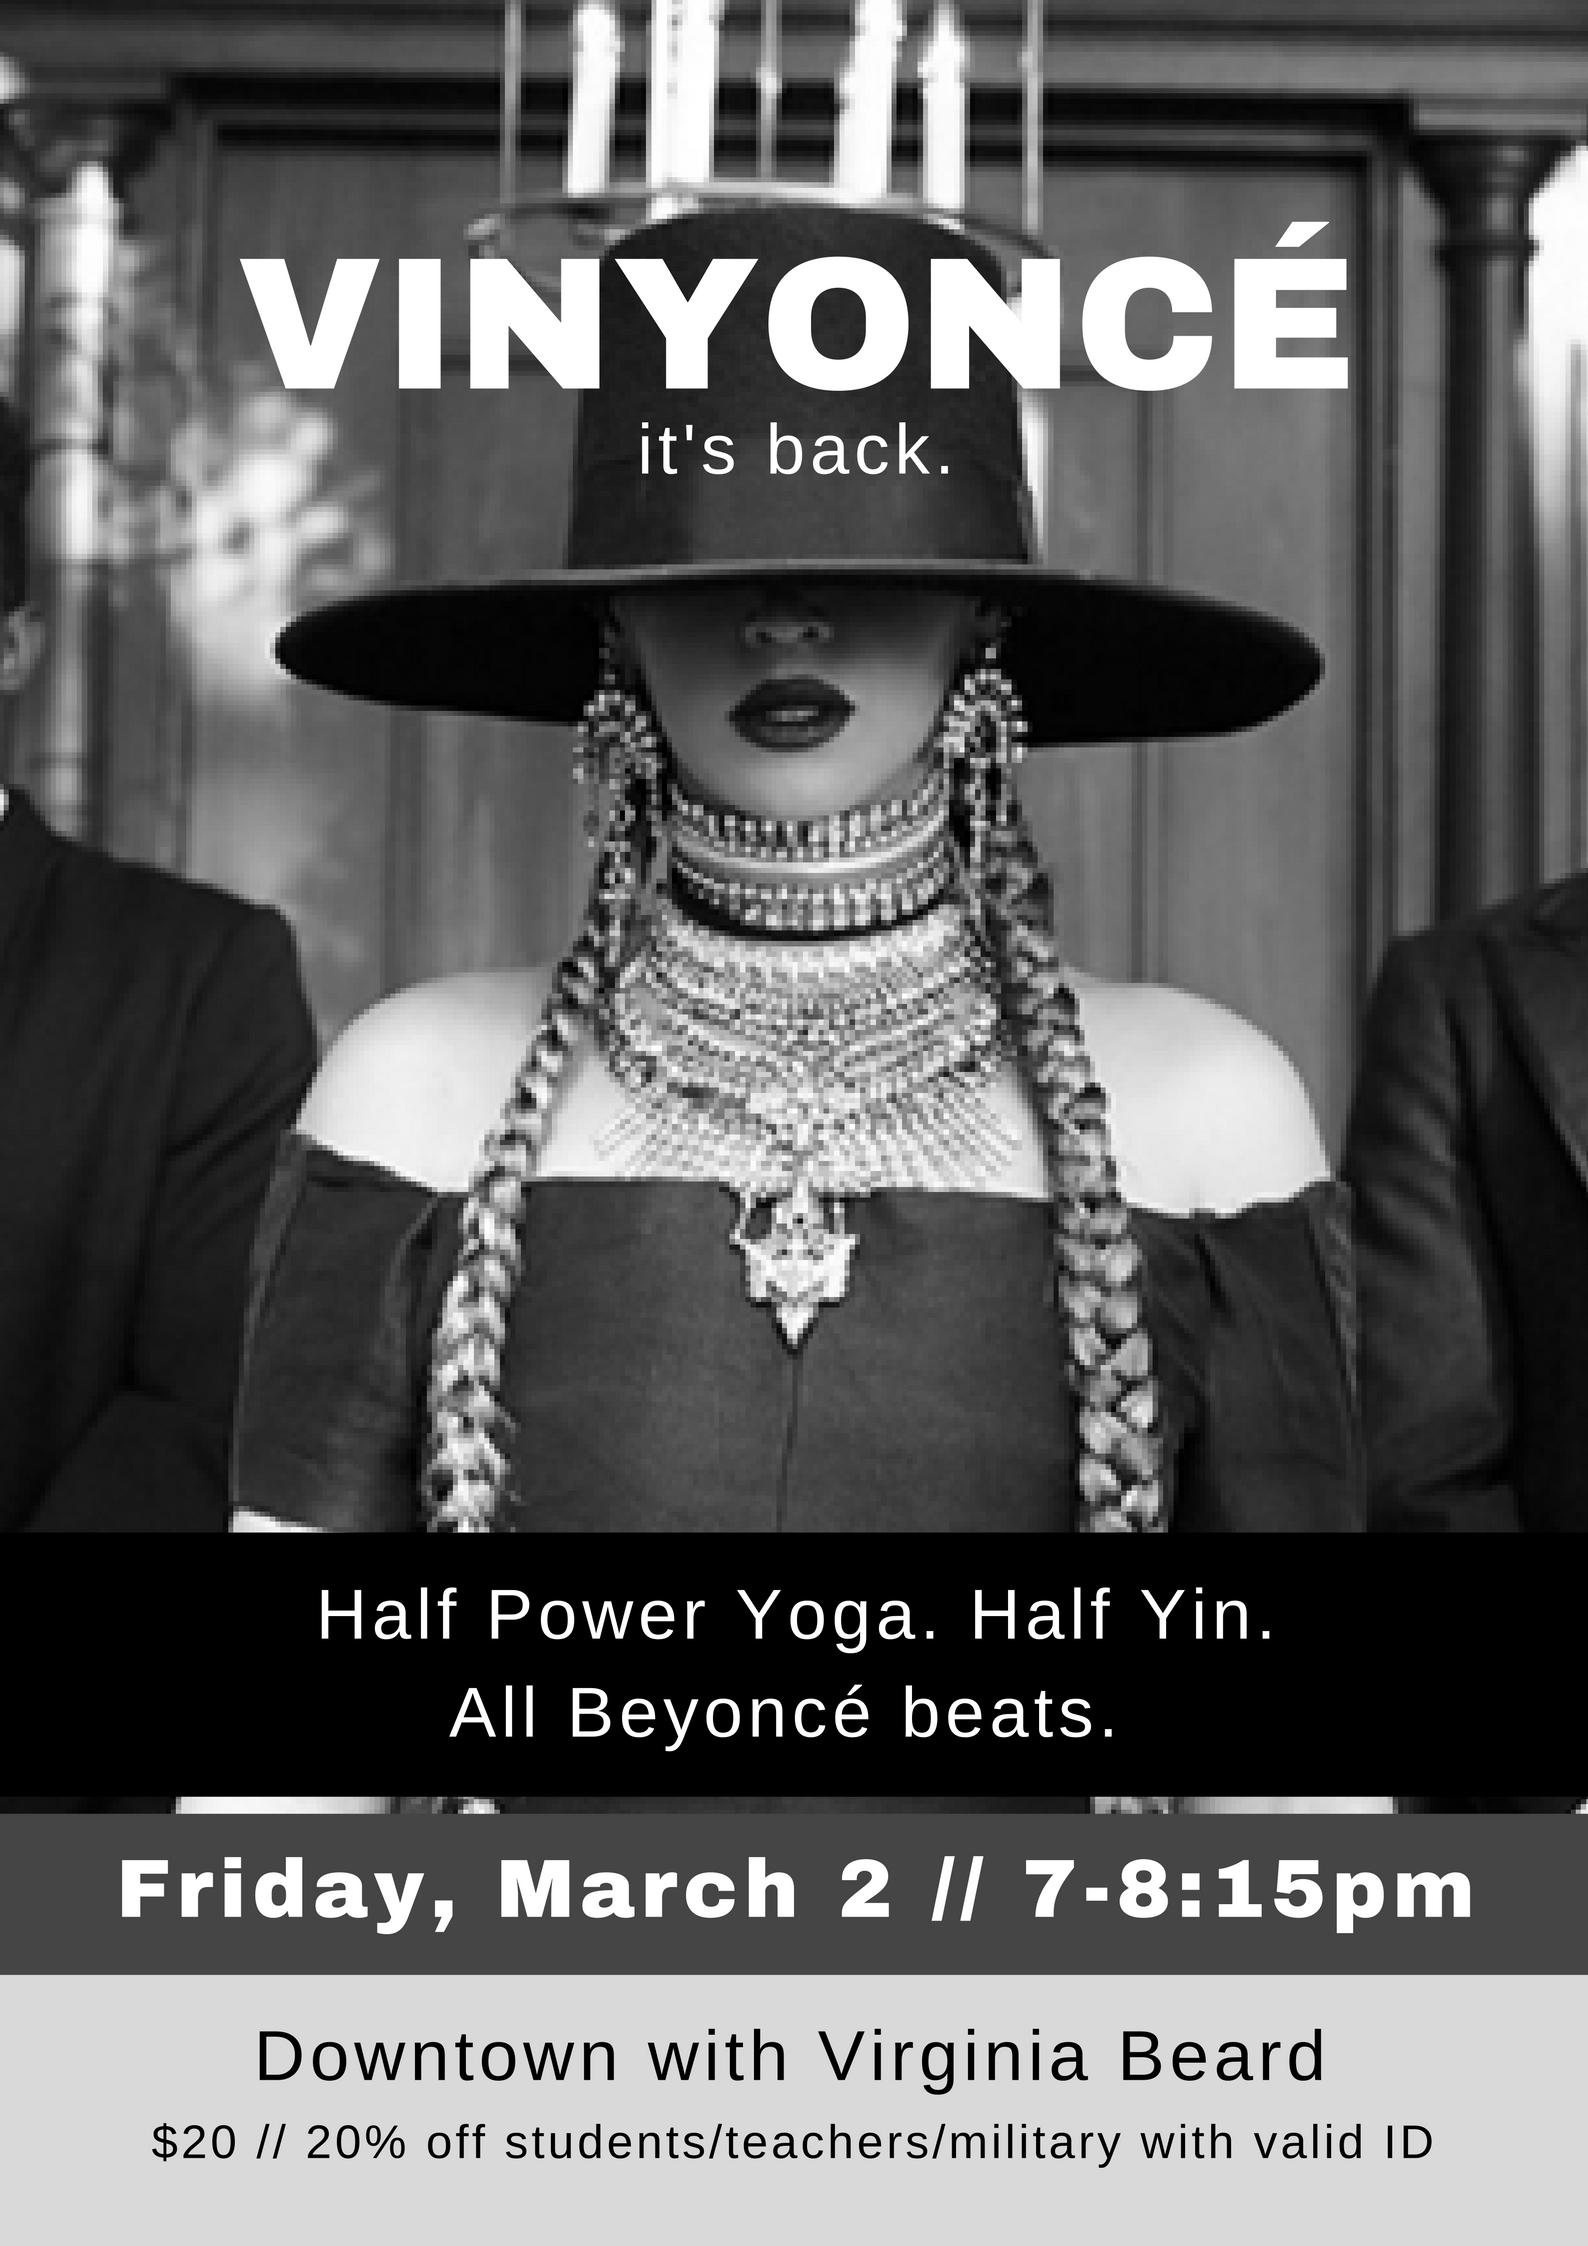 VinYonce-Final.jpg